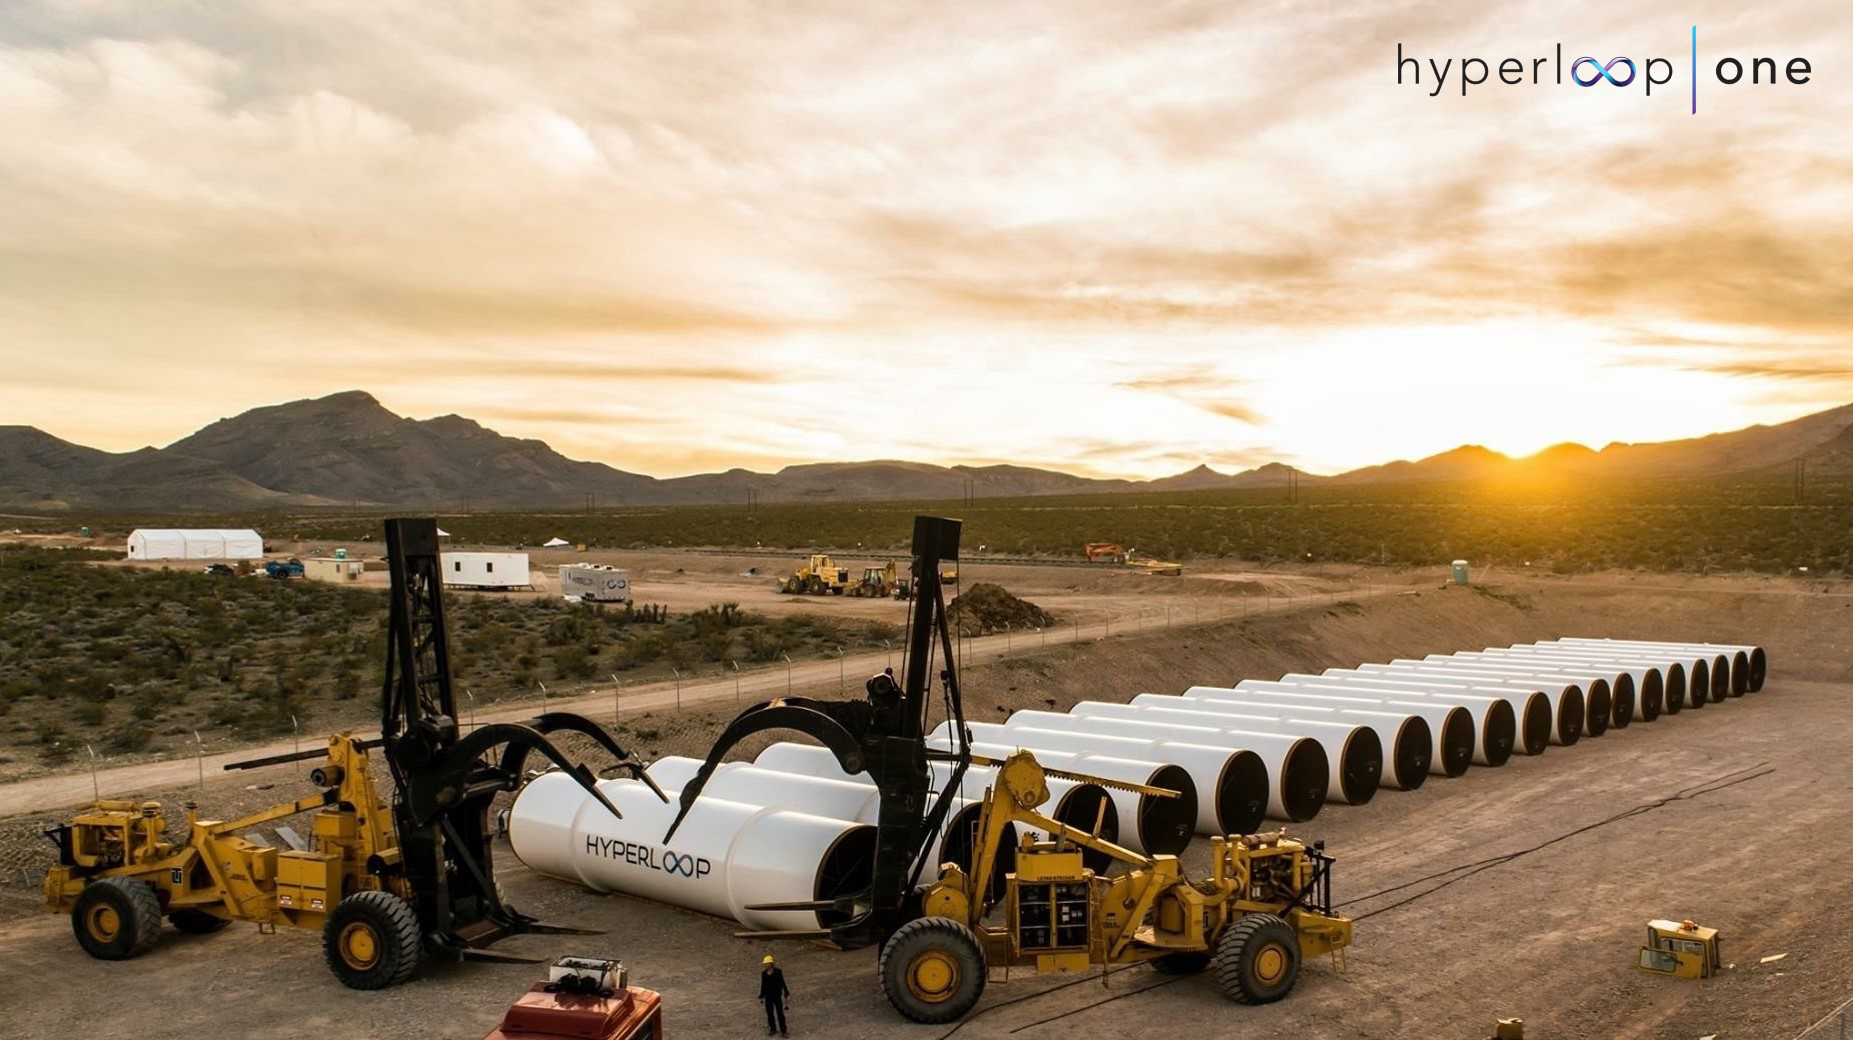 Hyperloop Futuristic Transportation System Has Its 1st Public Demo The Two Way Npr